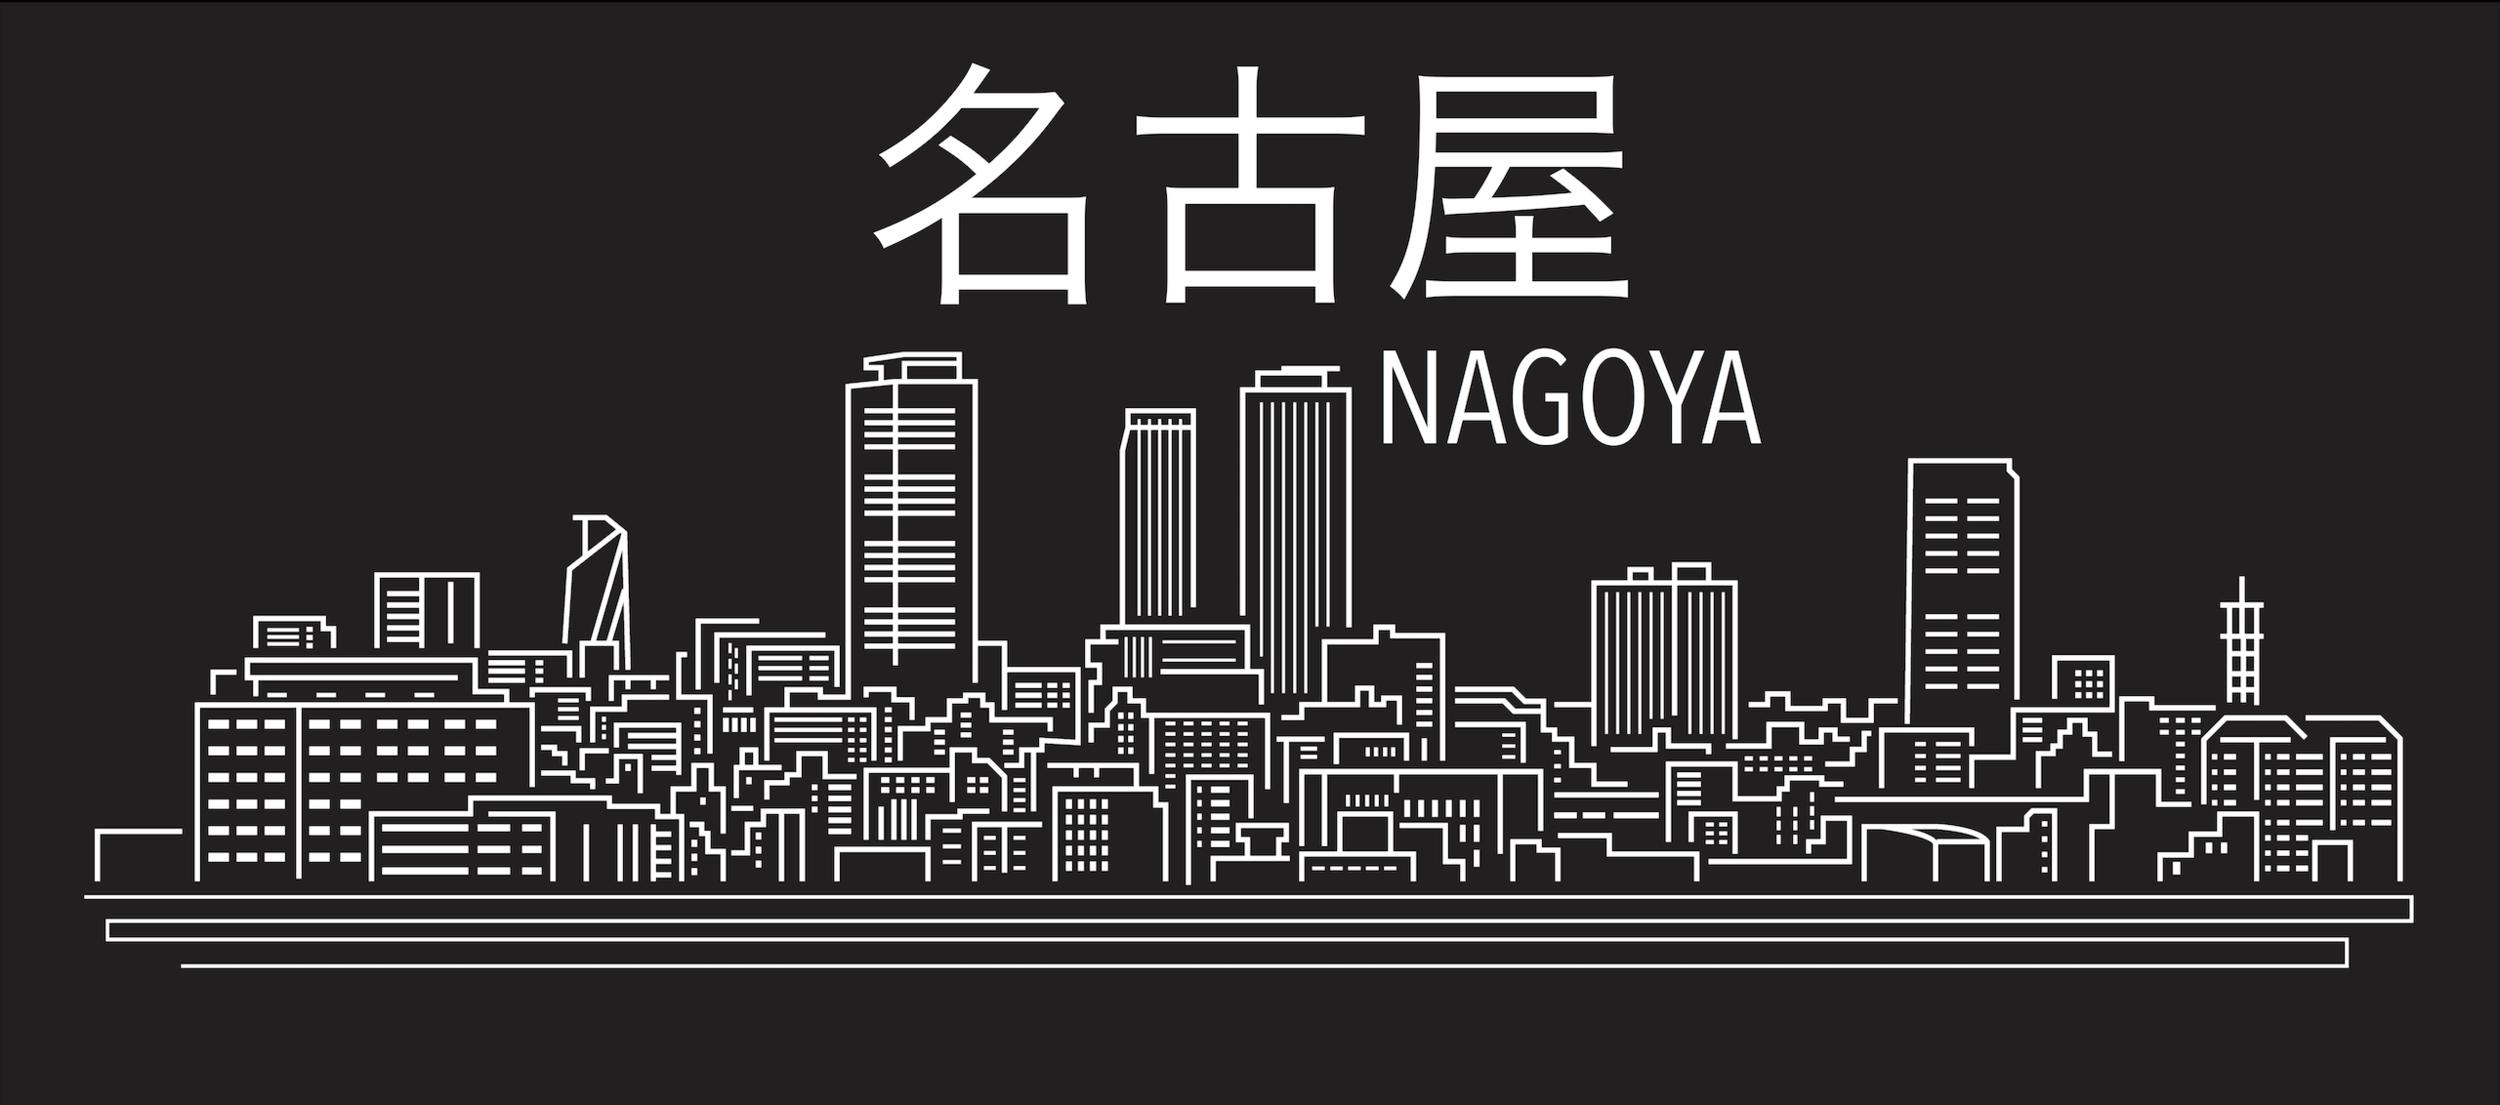 nagoya jpeg.jpg